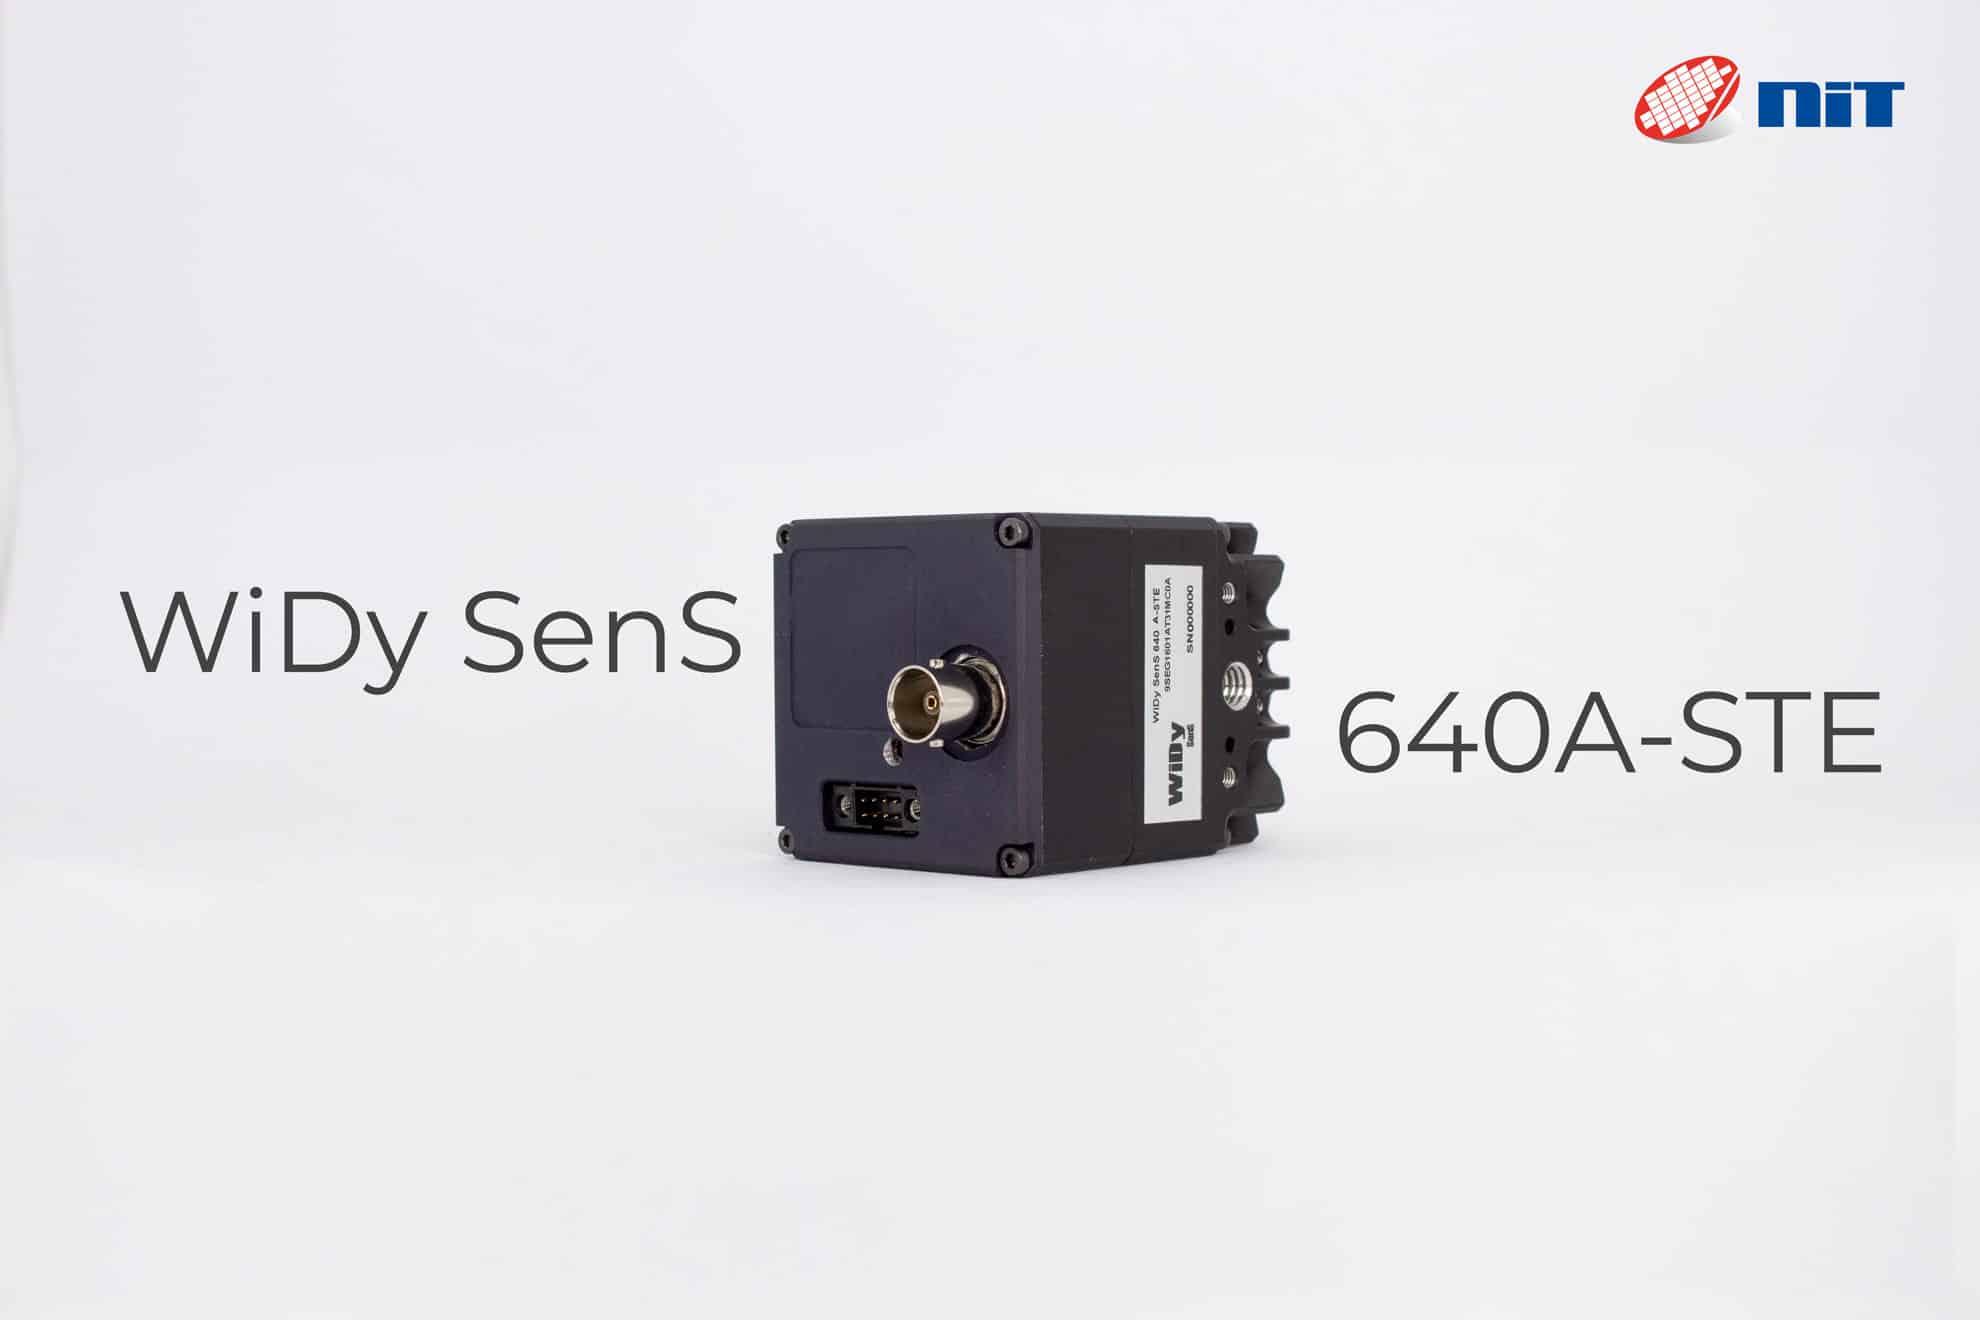 WiDy SenS 640A-STE